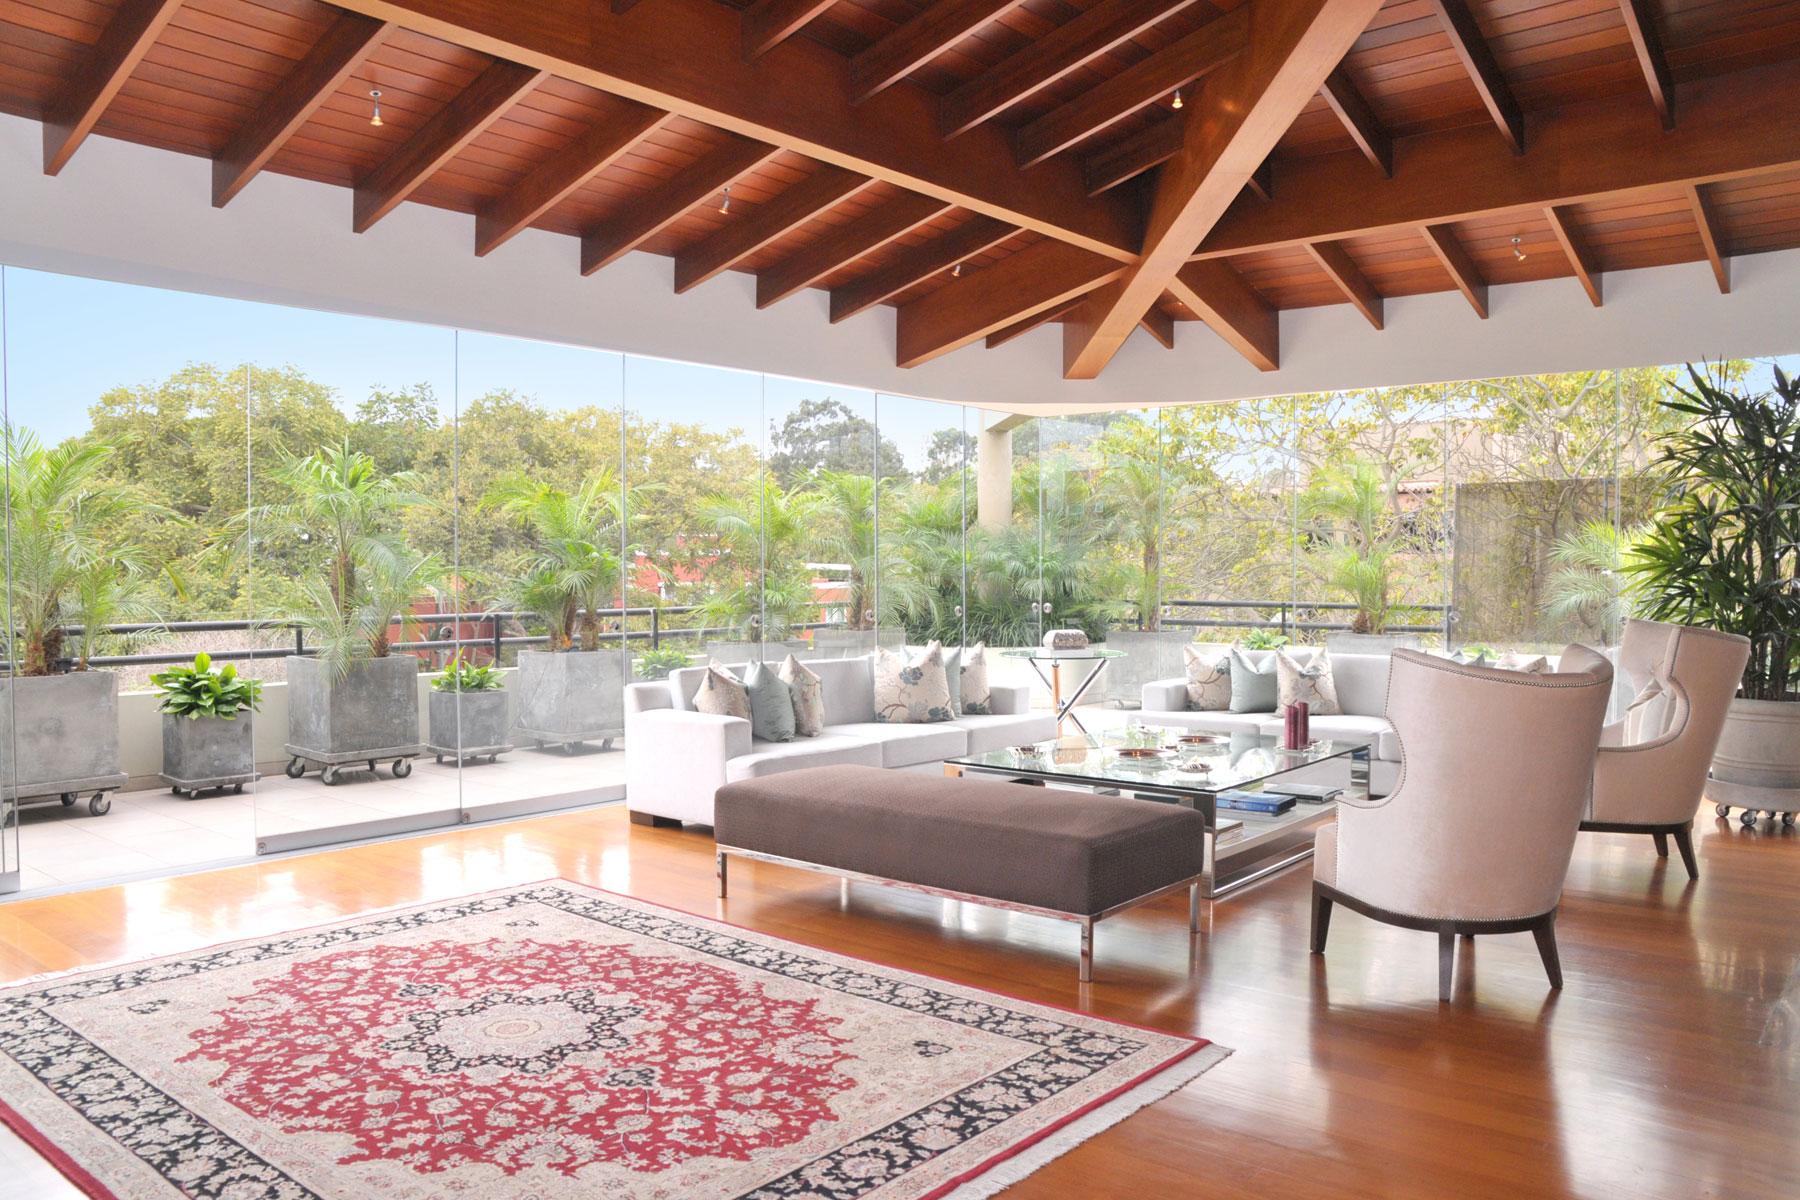 Apartment for Sale at Espectacular Pent House Dúplex ubicado en la zona de parques Calle Mariscal Blas Cerdeña San Isidro, Lima, 27 Peru